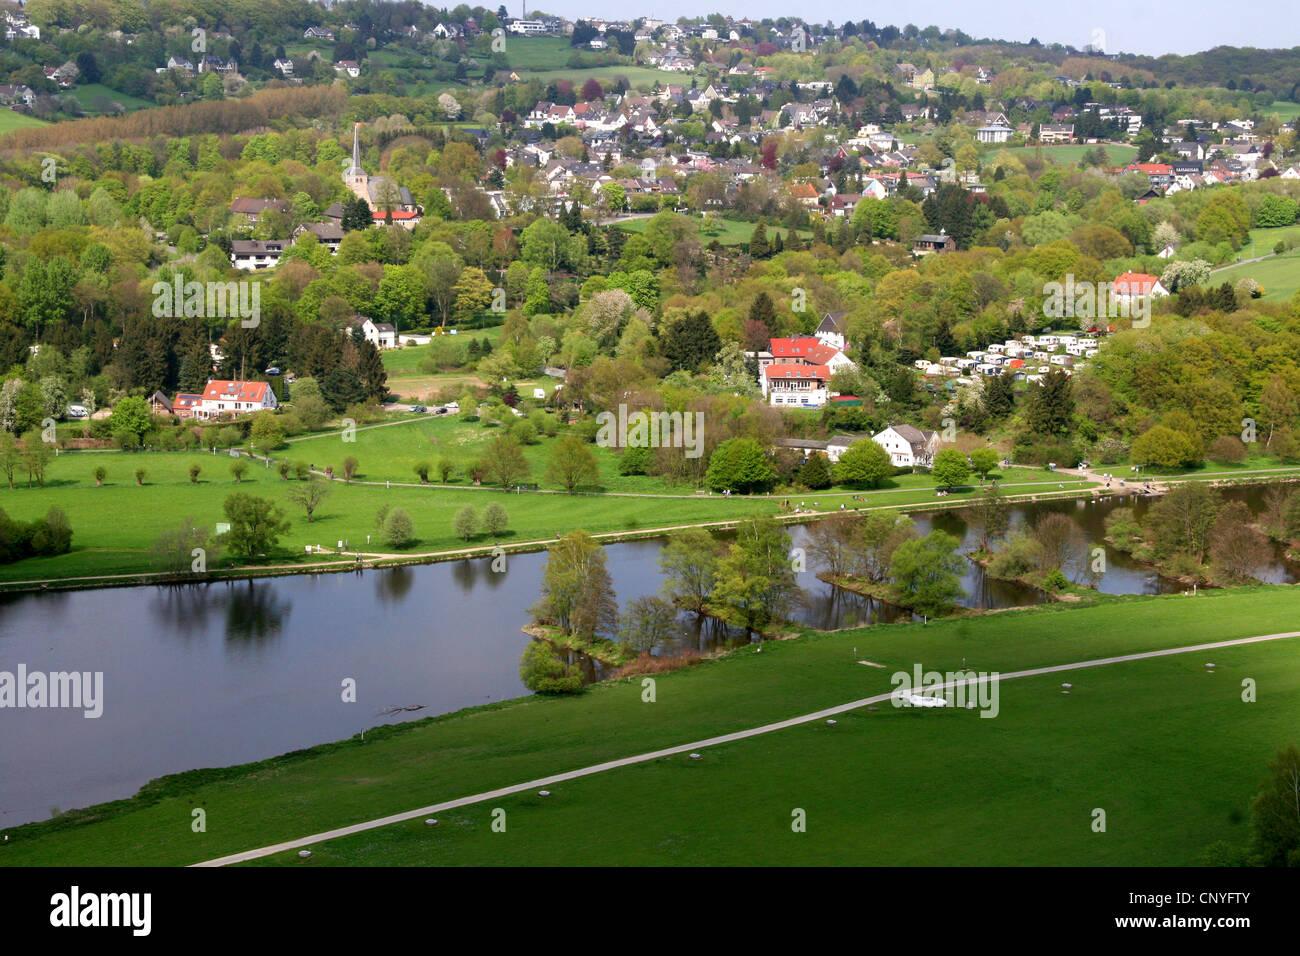 Vista del Valle de Ruhr con iglesia Stiepeler Dorfkirche del Castillo Blankenstein, Alemania, Renania del Norte-Westfalia, Hattingen Blankenstein Foto de stock